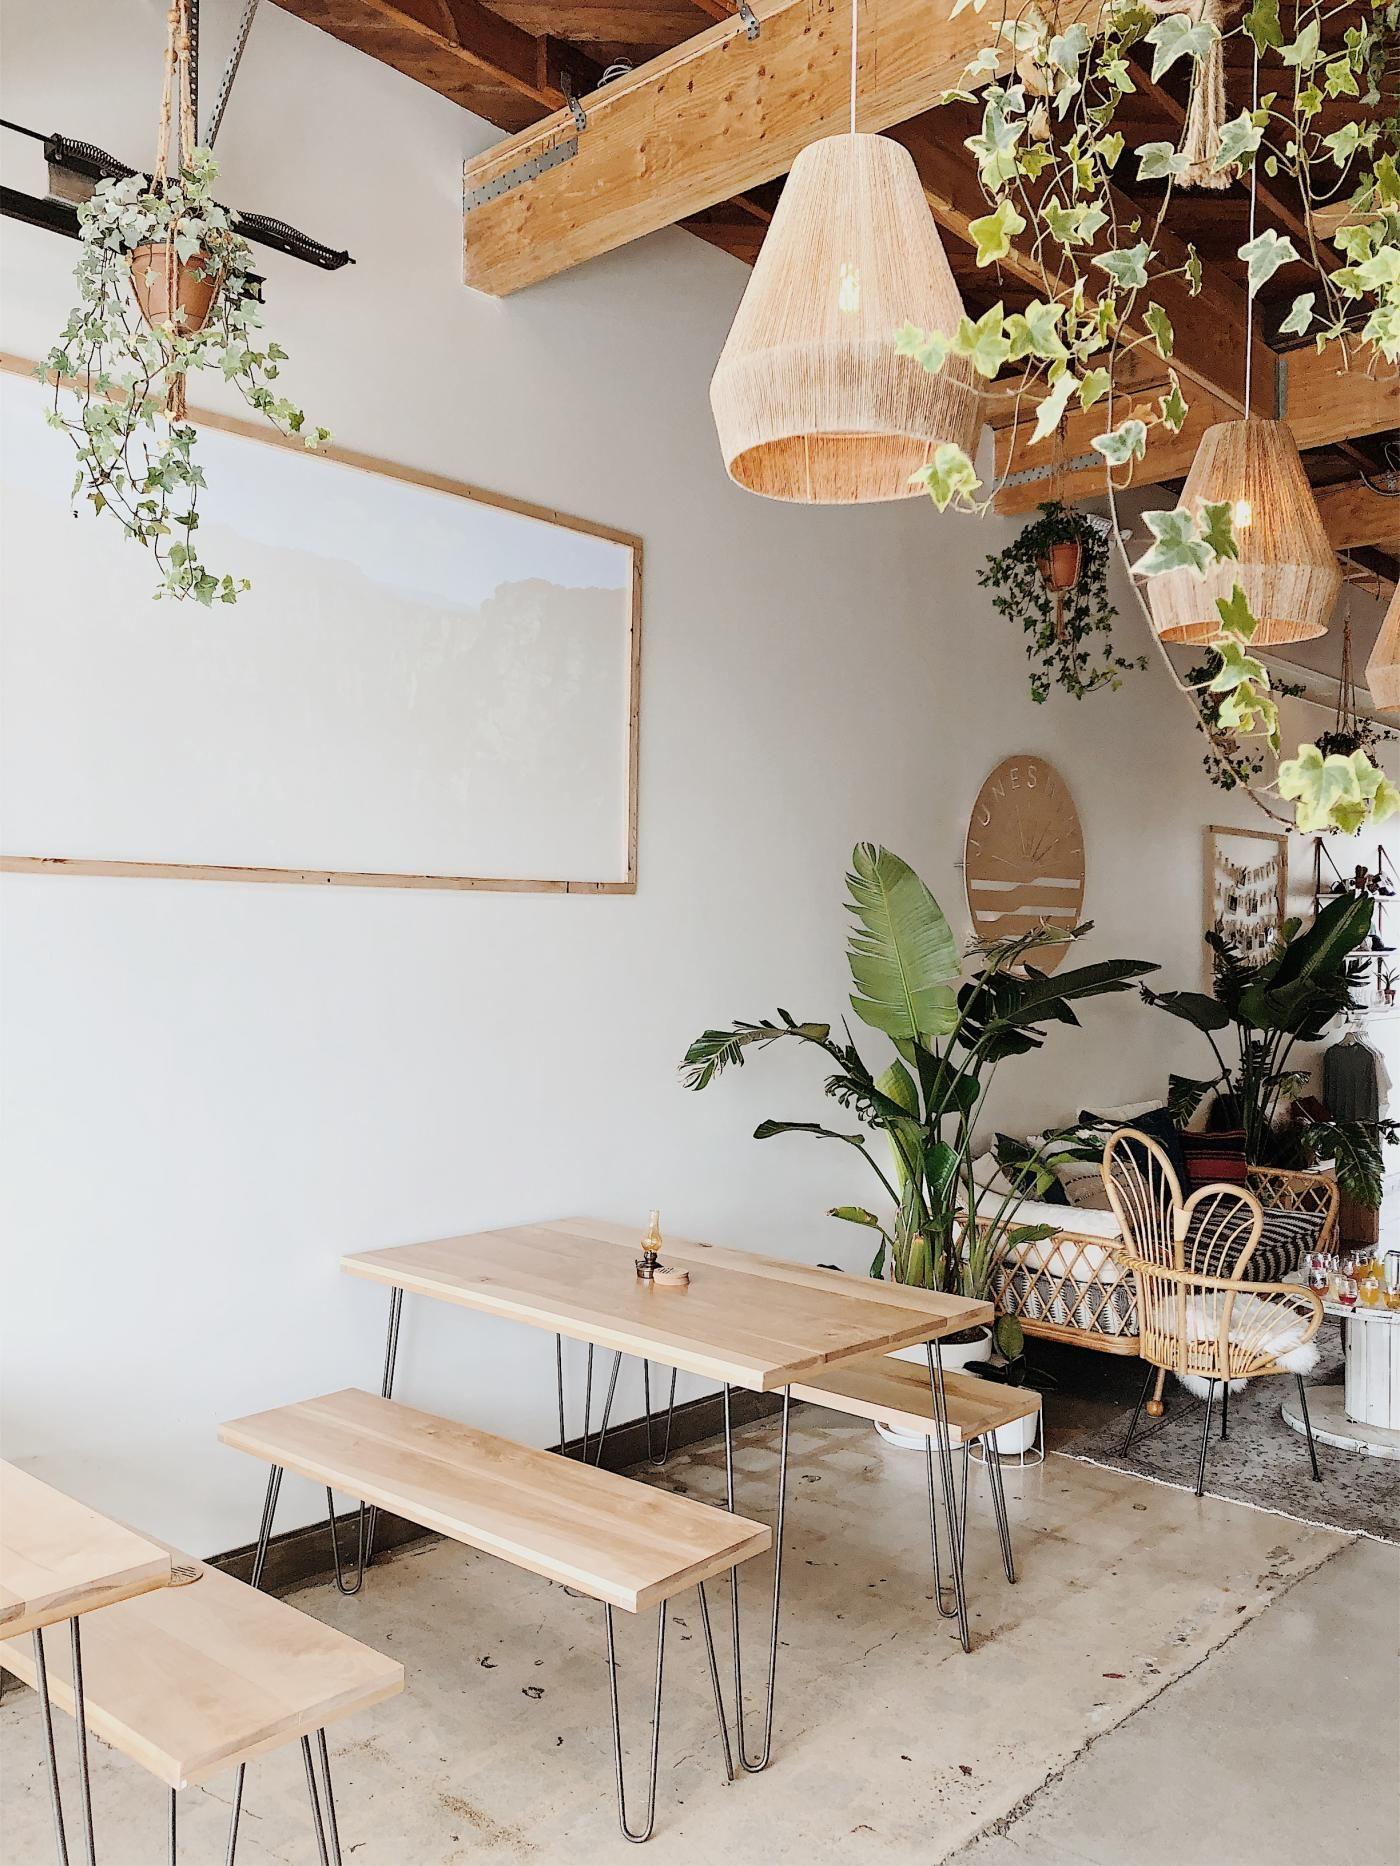 Park Art|My WordPress Blog_How To Make Hard Kombucha At Home